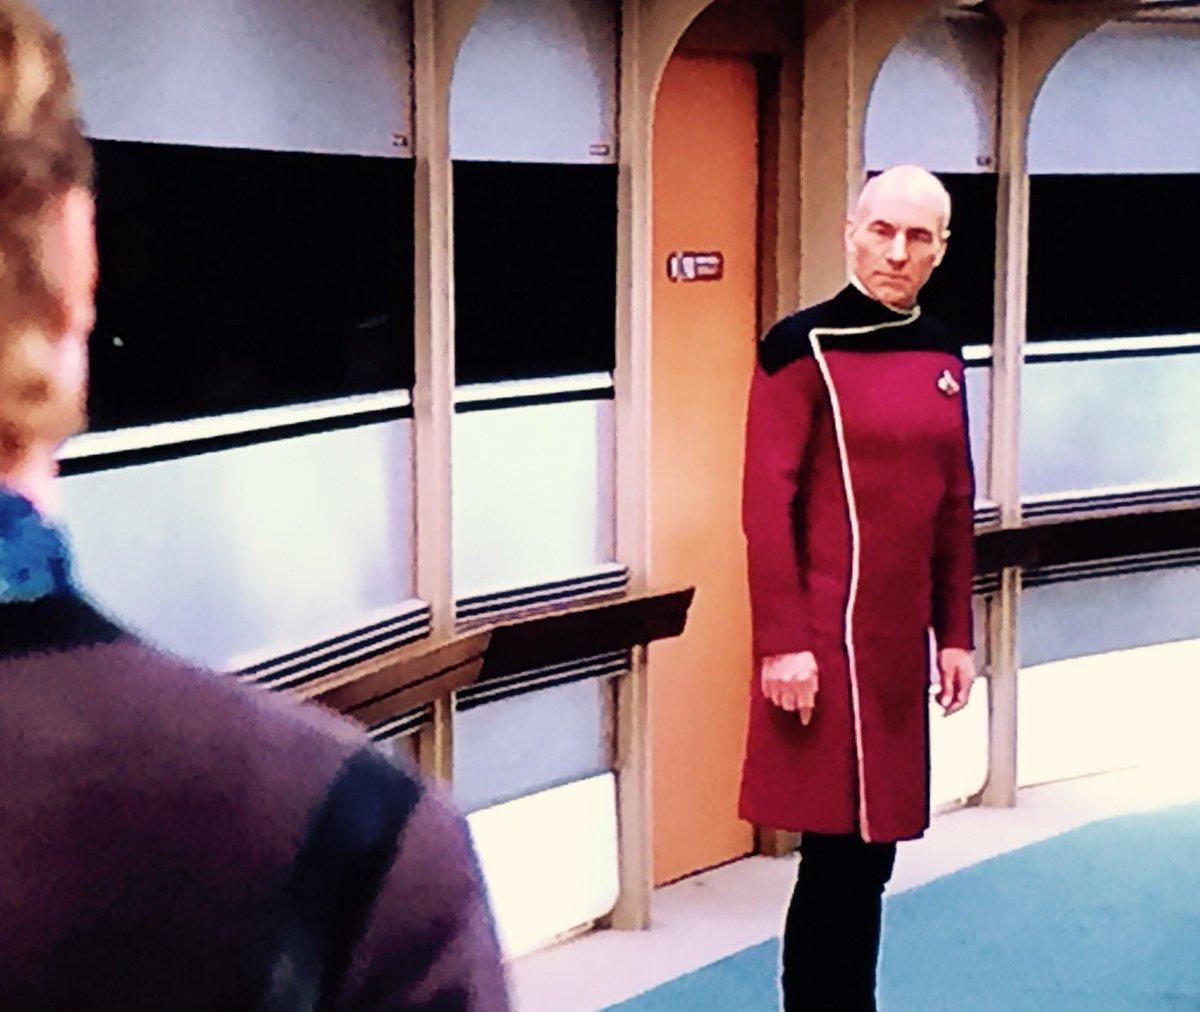 Look at this precious starmuffin in his DRESS uniform. <3 https://t.co/UEGw2u8TAI